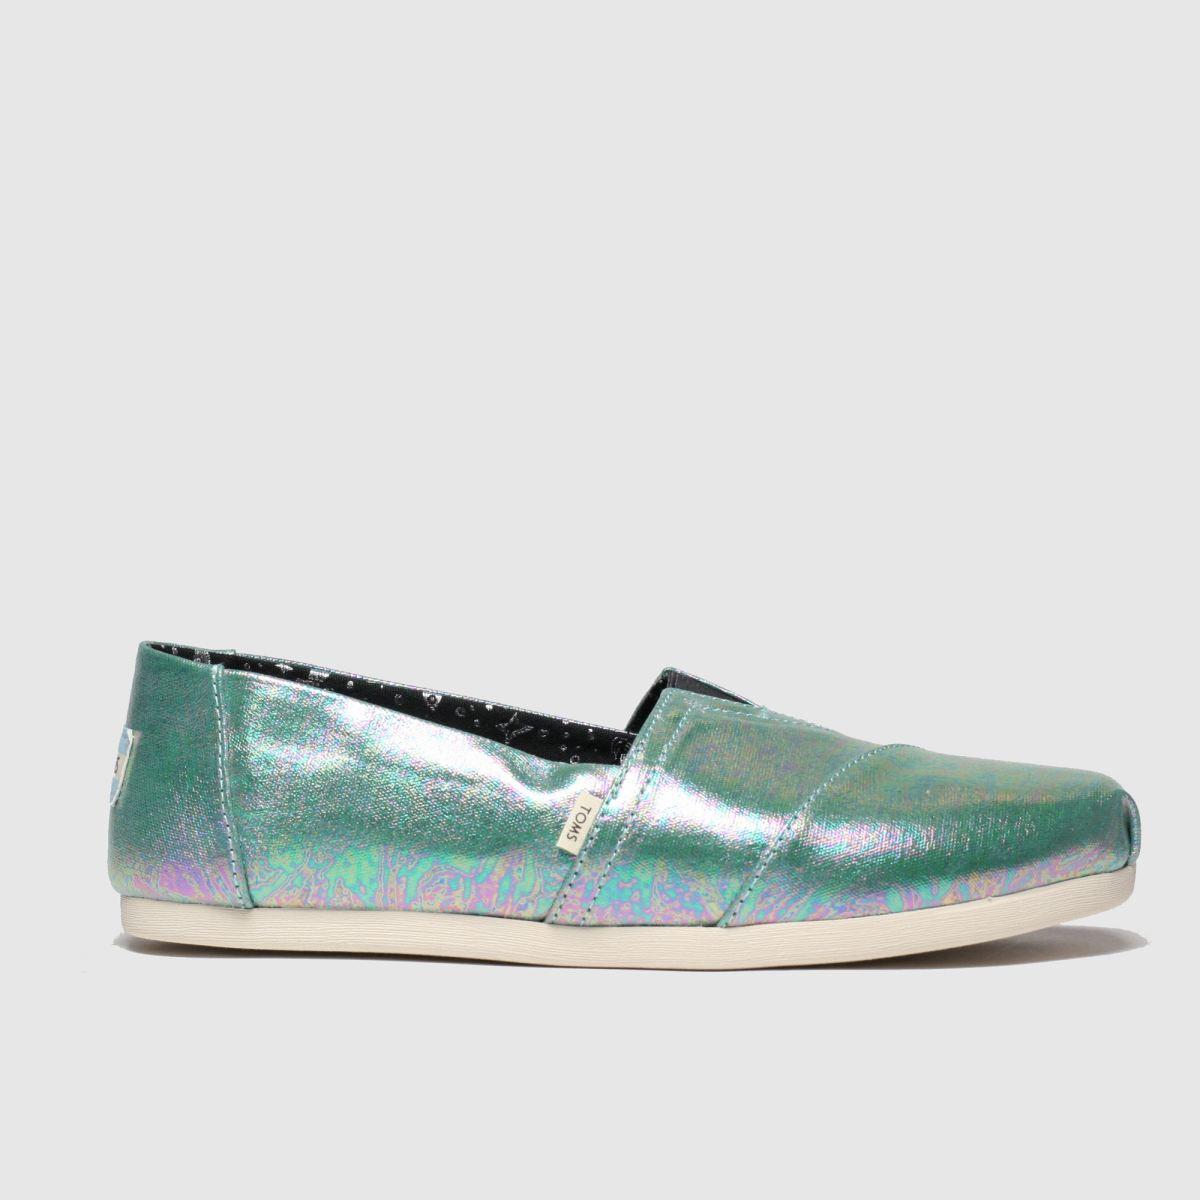 Toms Green Alpargata 3.0 Metallic Flat Shoes